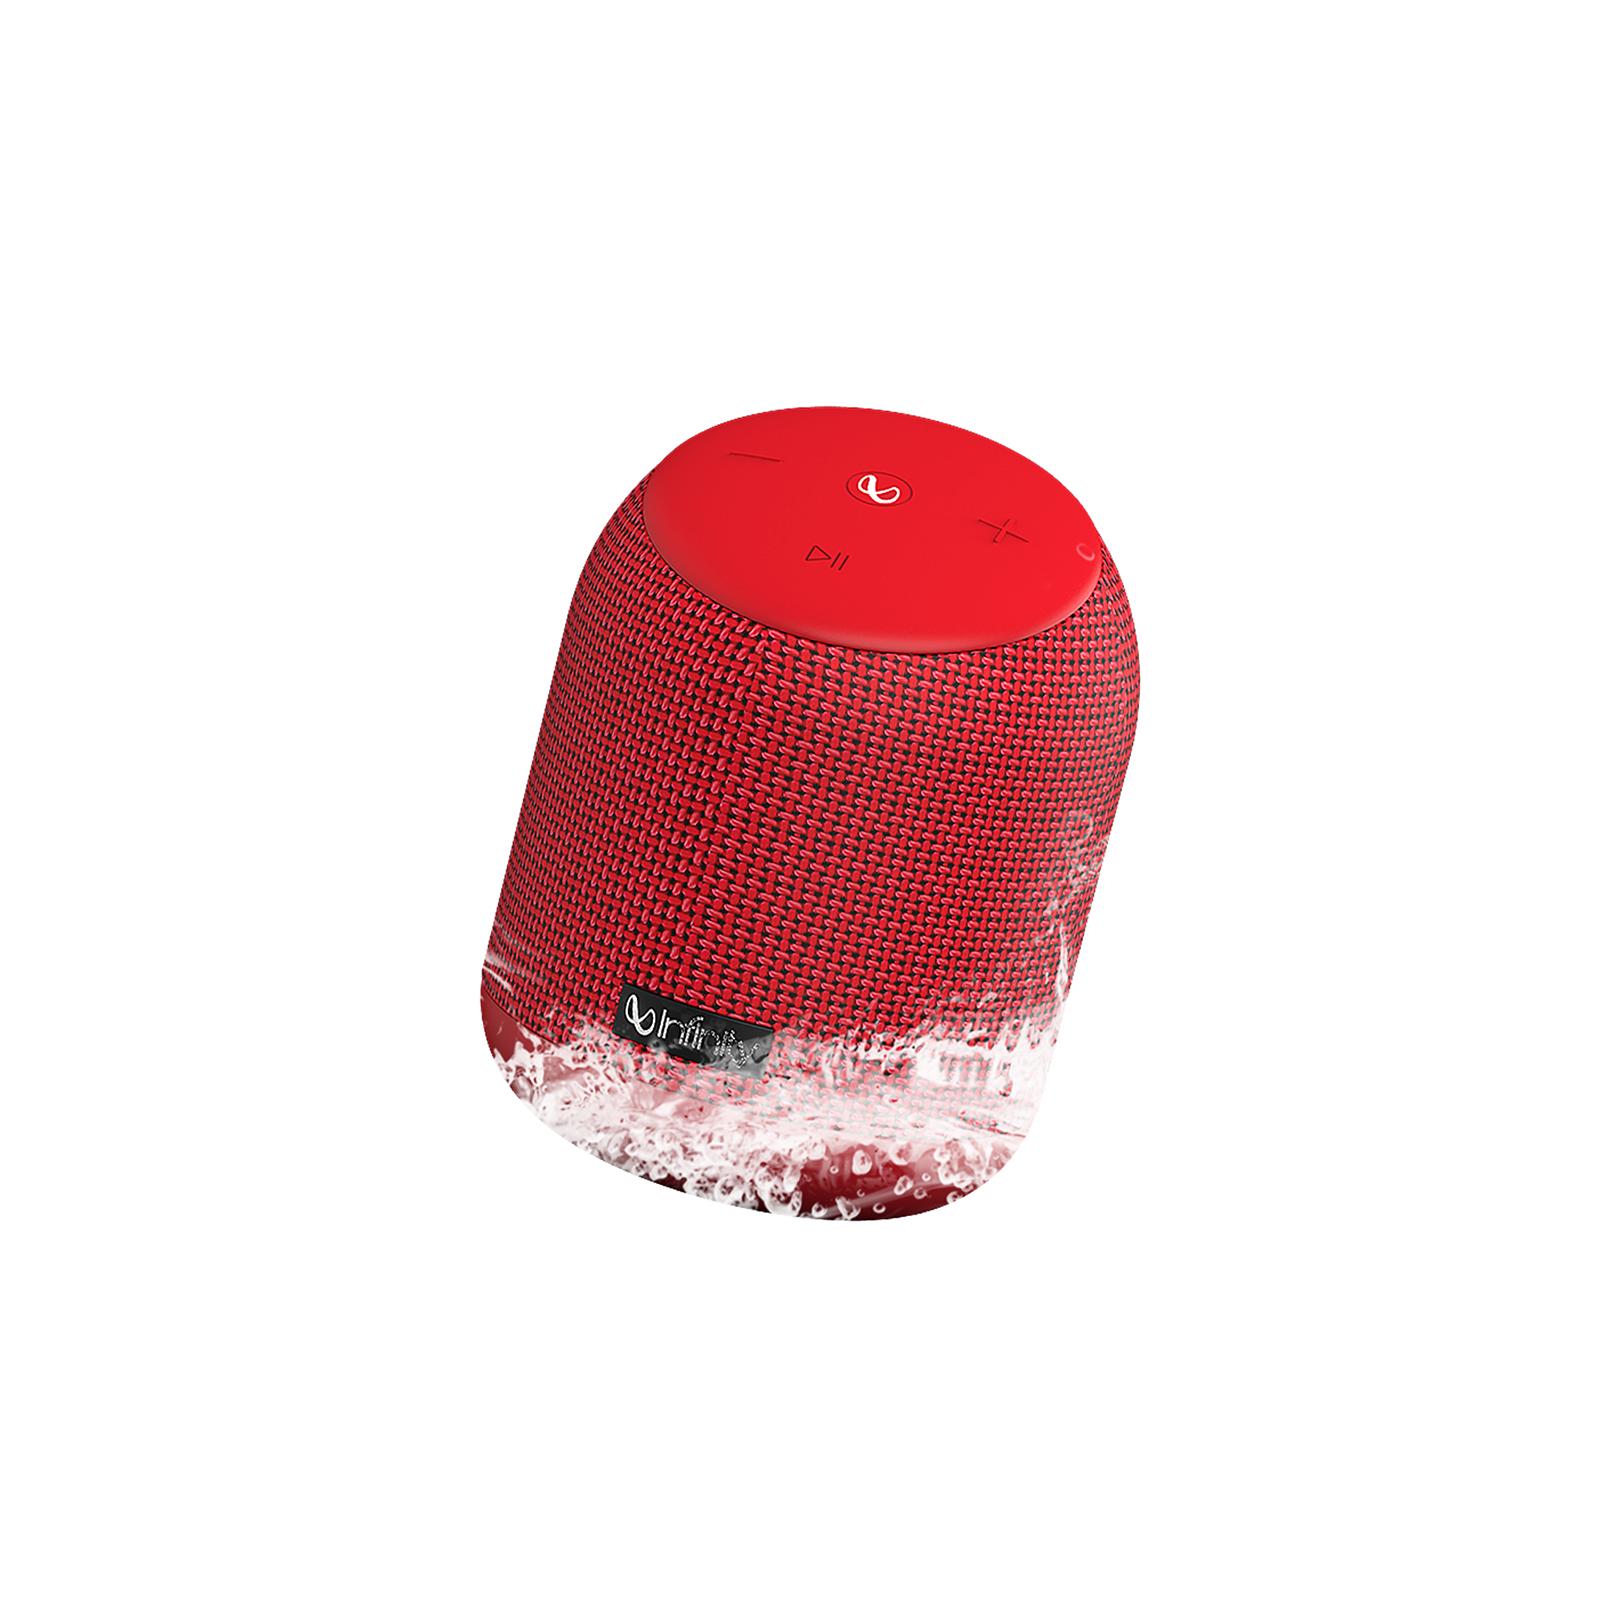 INFINITY FUZE 200 - Red - Portable Wireless Speakers - Hero